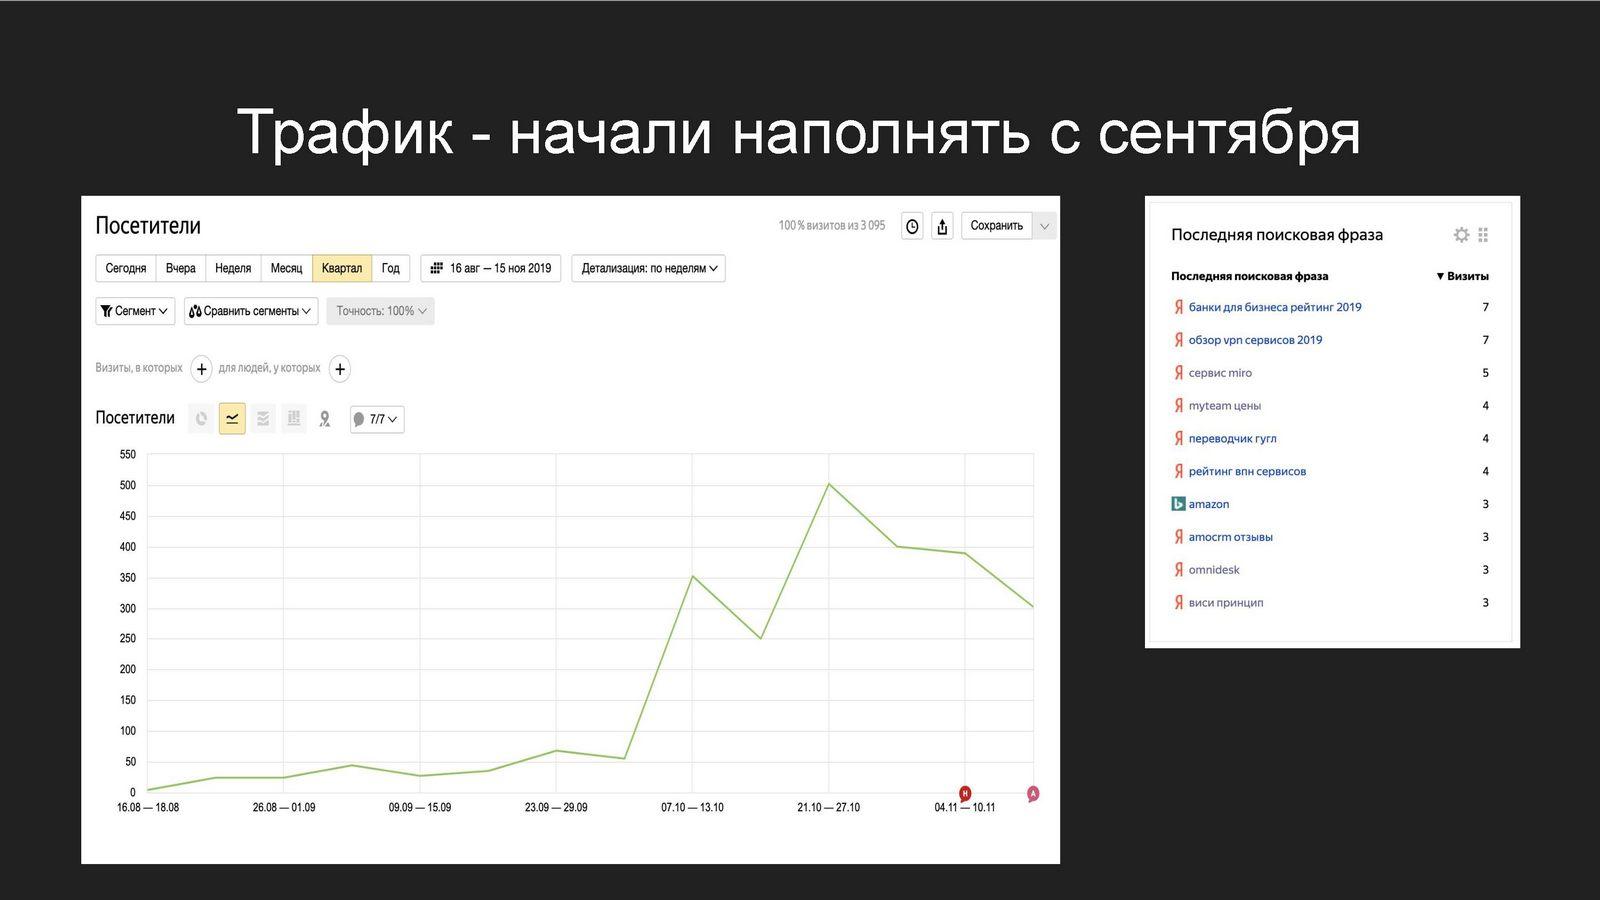 wp10-Анатолий Юмашев-Агрегатор bizzapps.ru 20